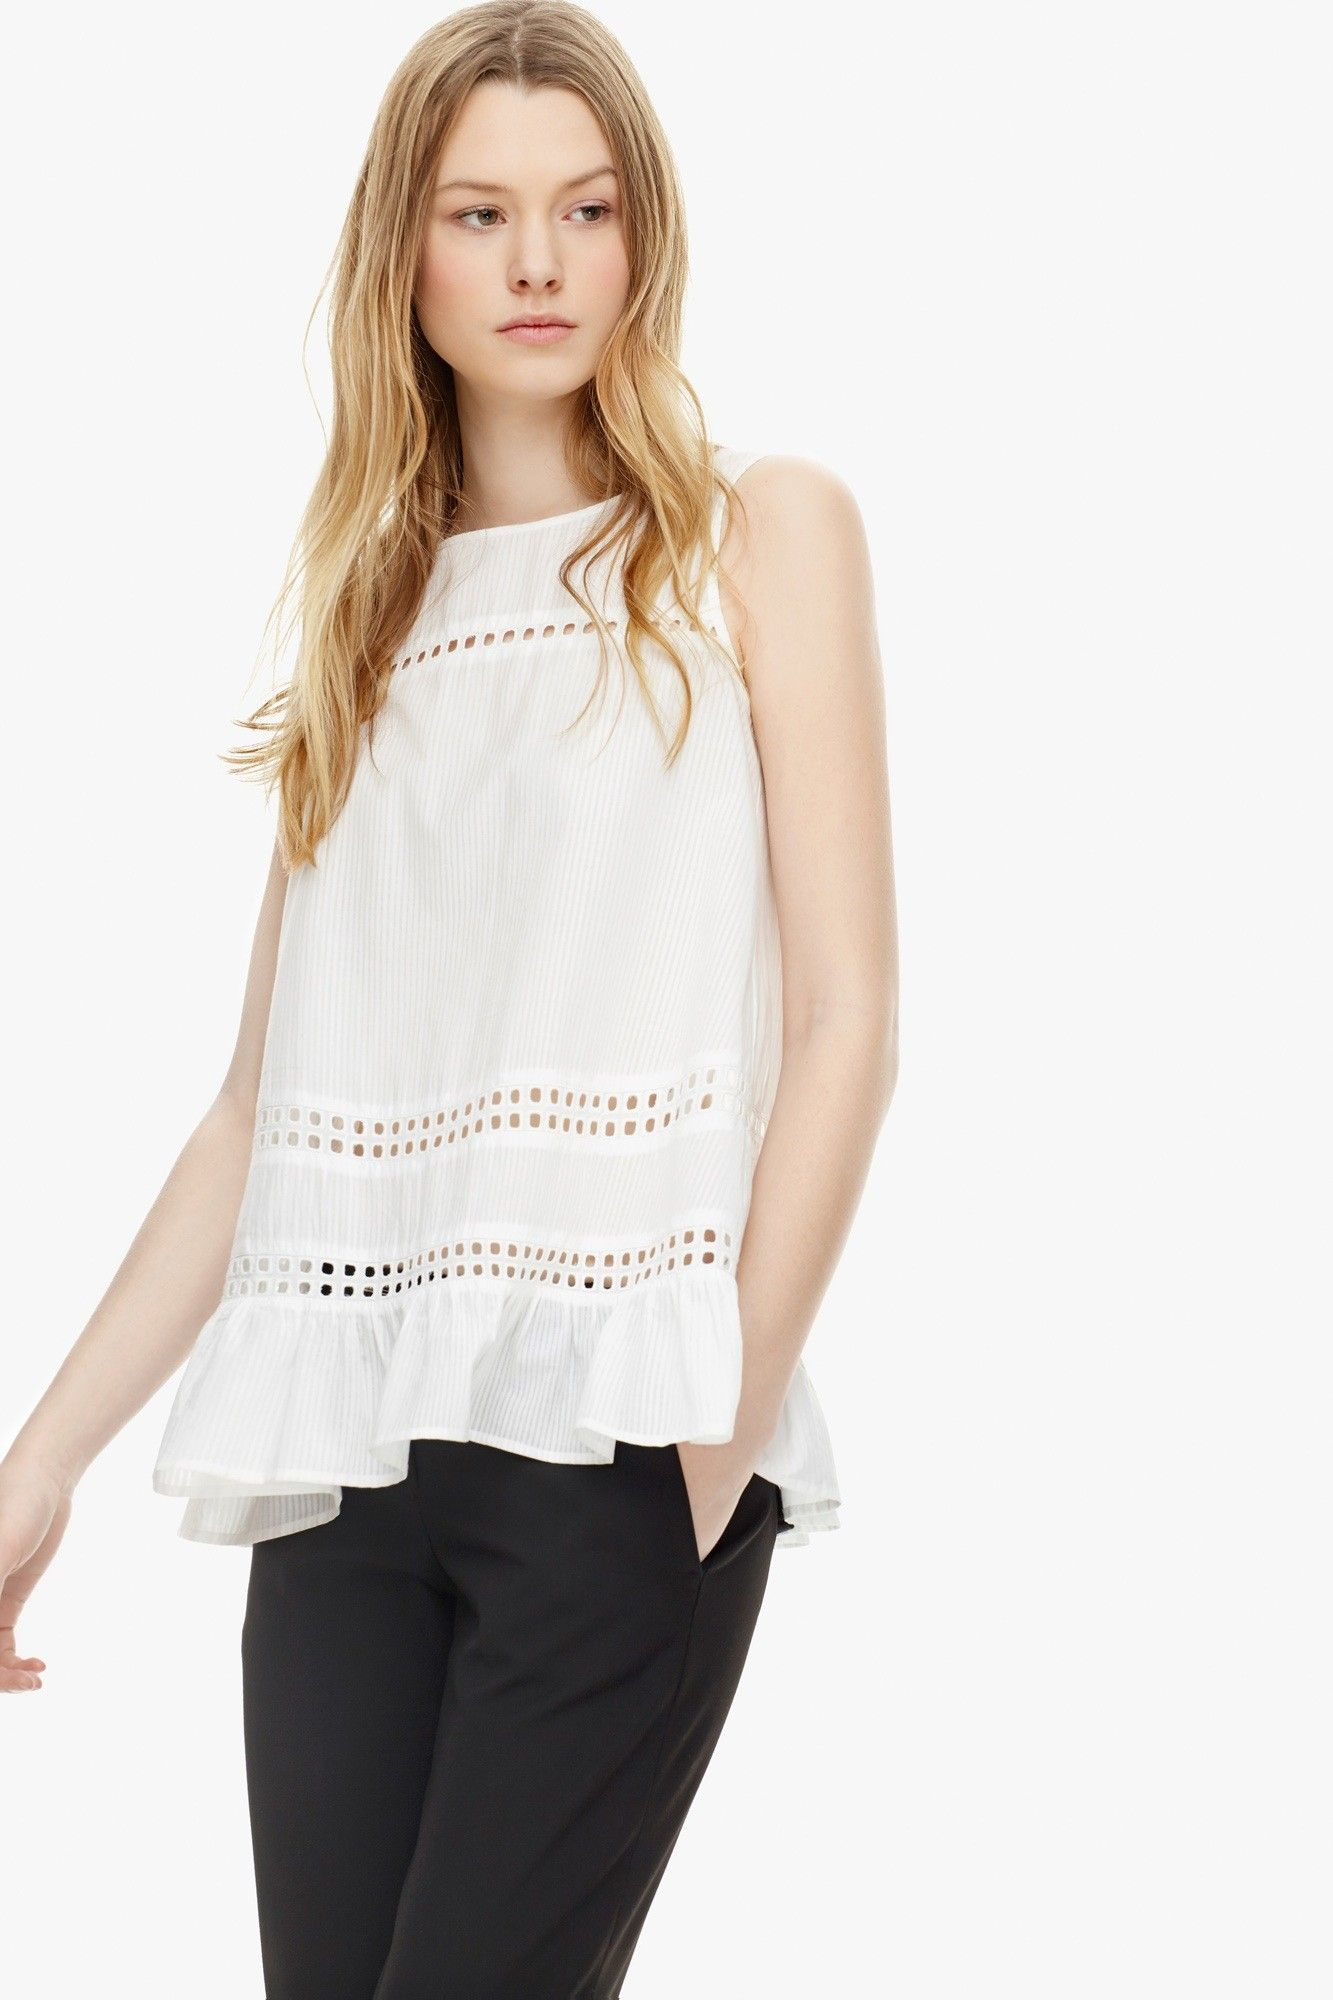 Top algod n vuelo camisas tops adolfo dominguez shop for Adolfo dominguez outlet online